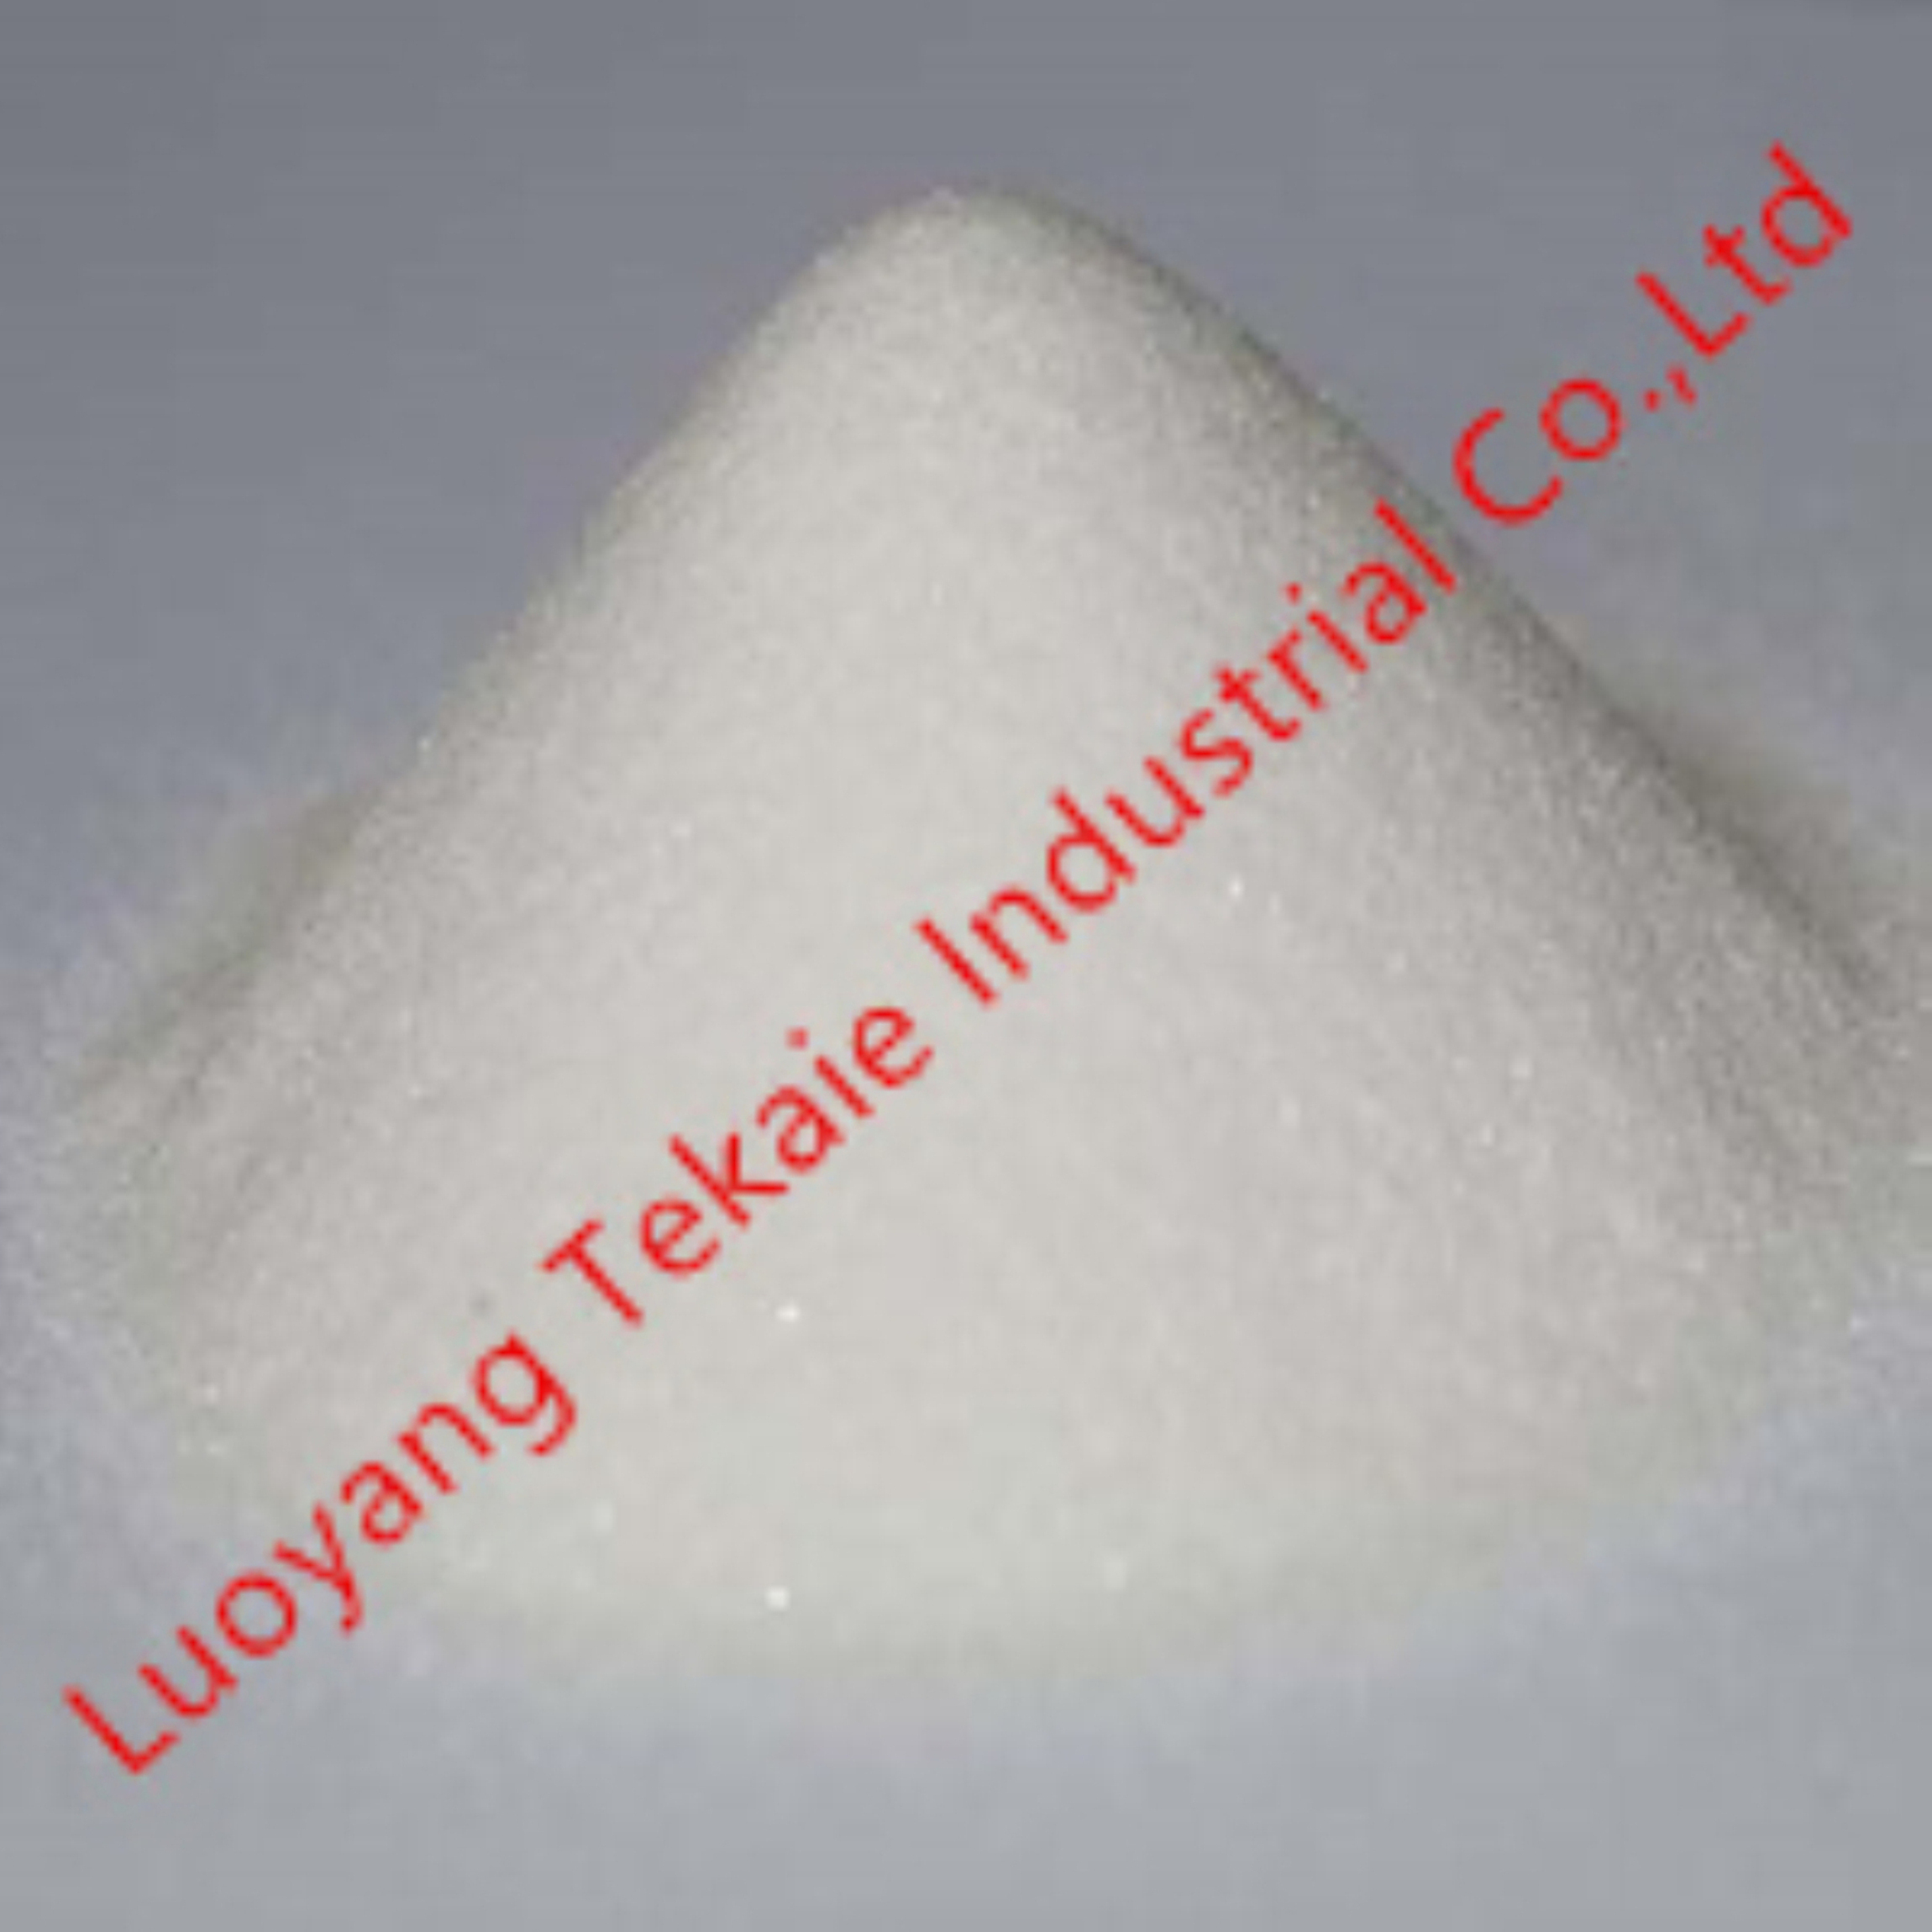 White fused alumina used for Resin bonded grinding wheels